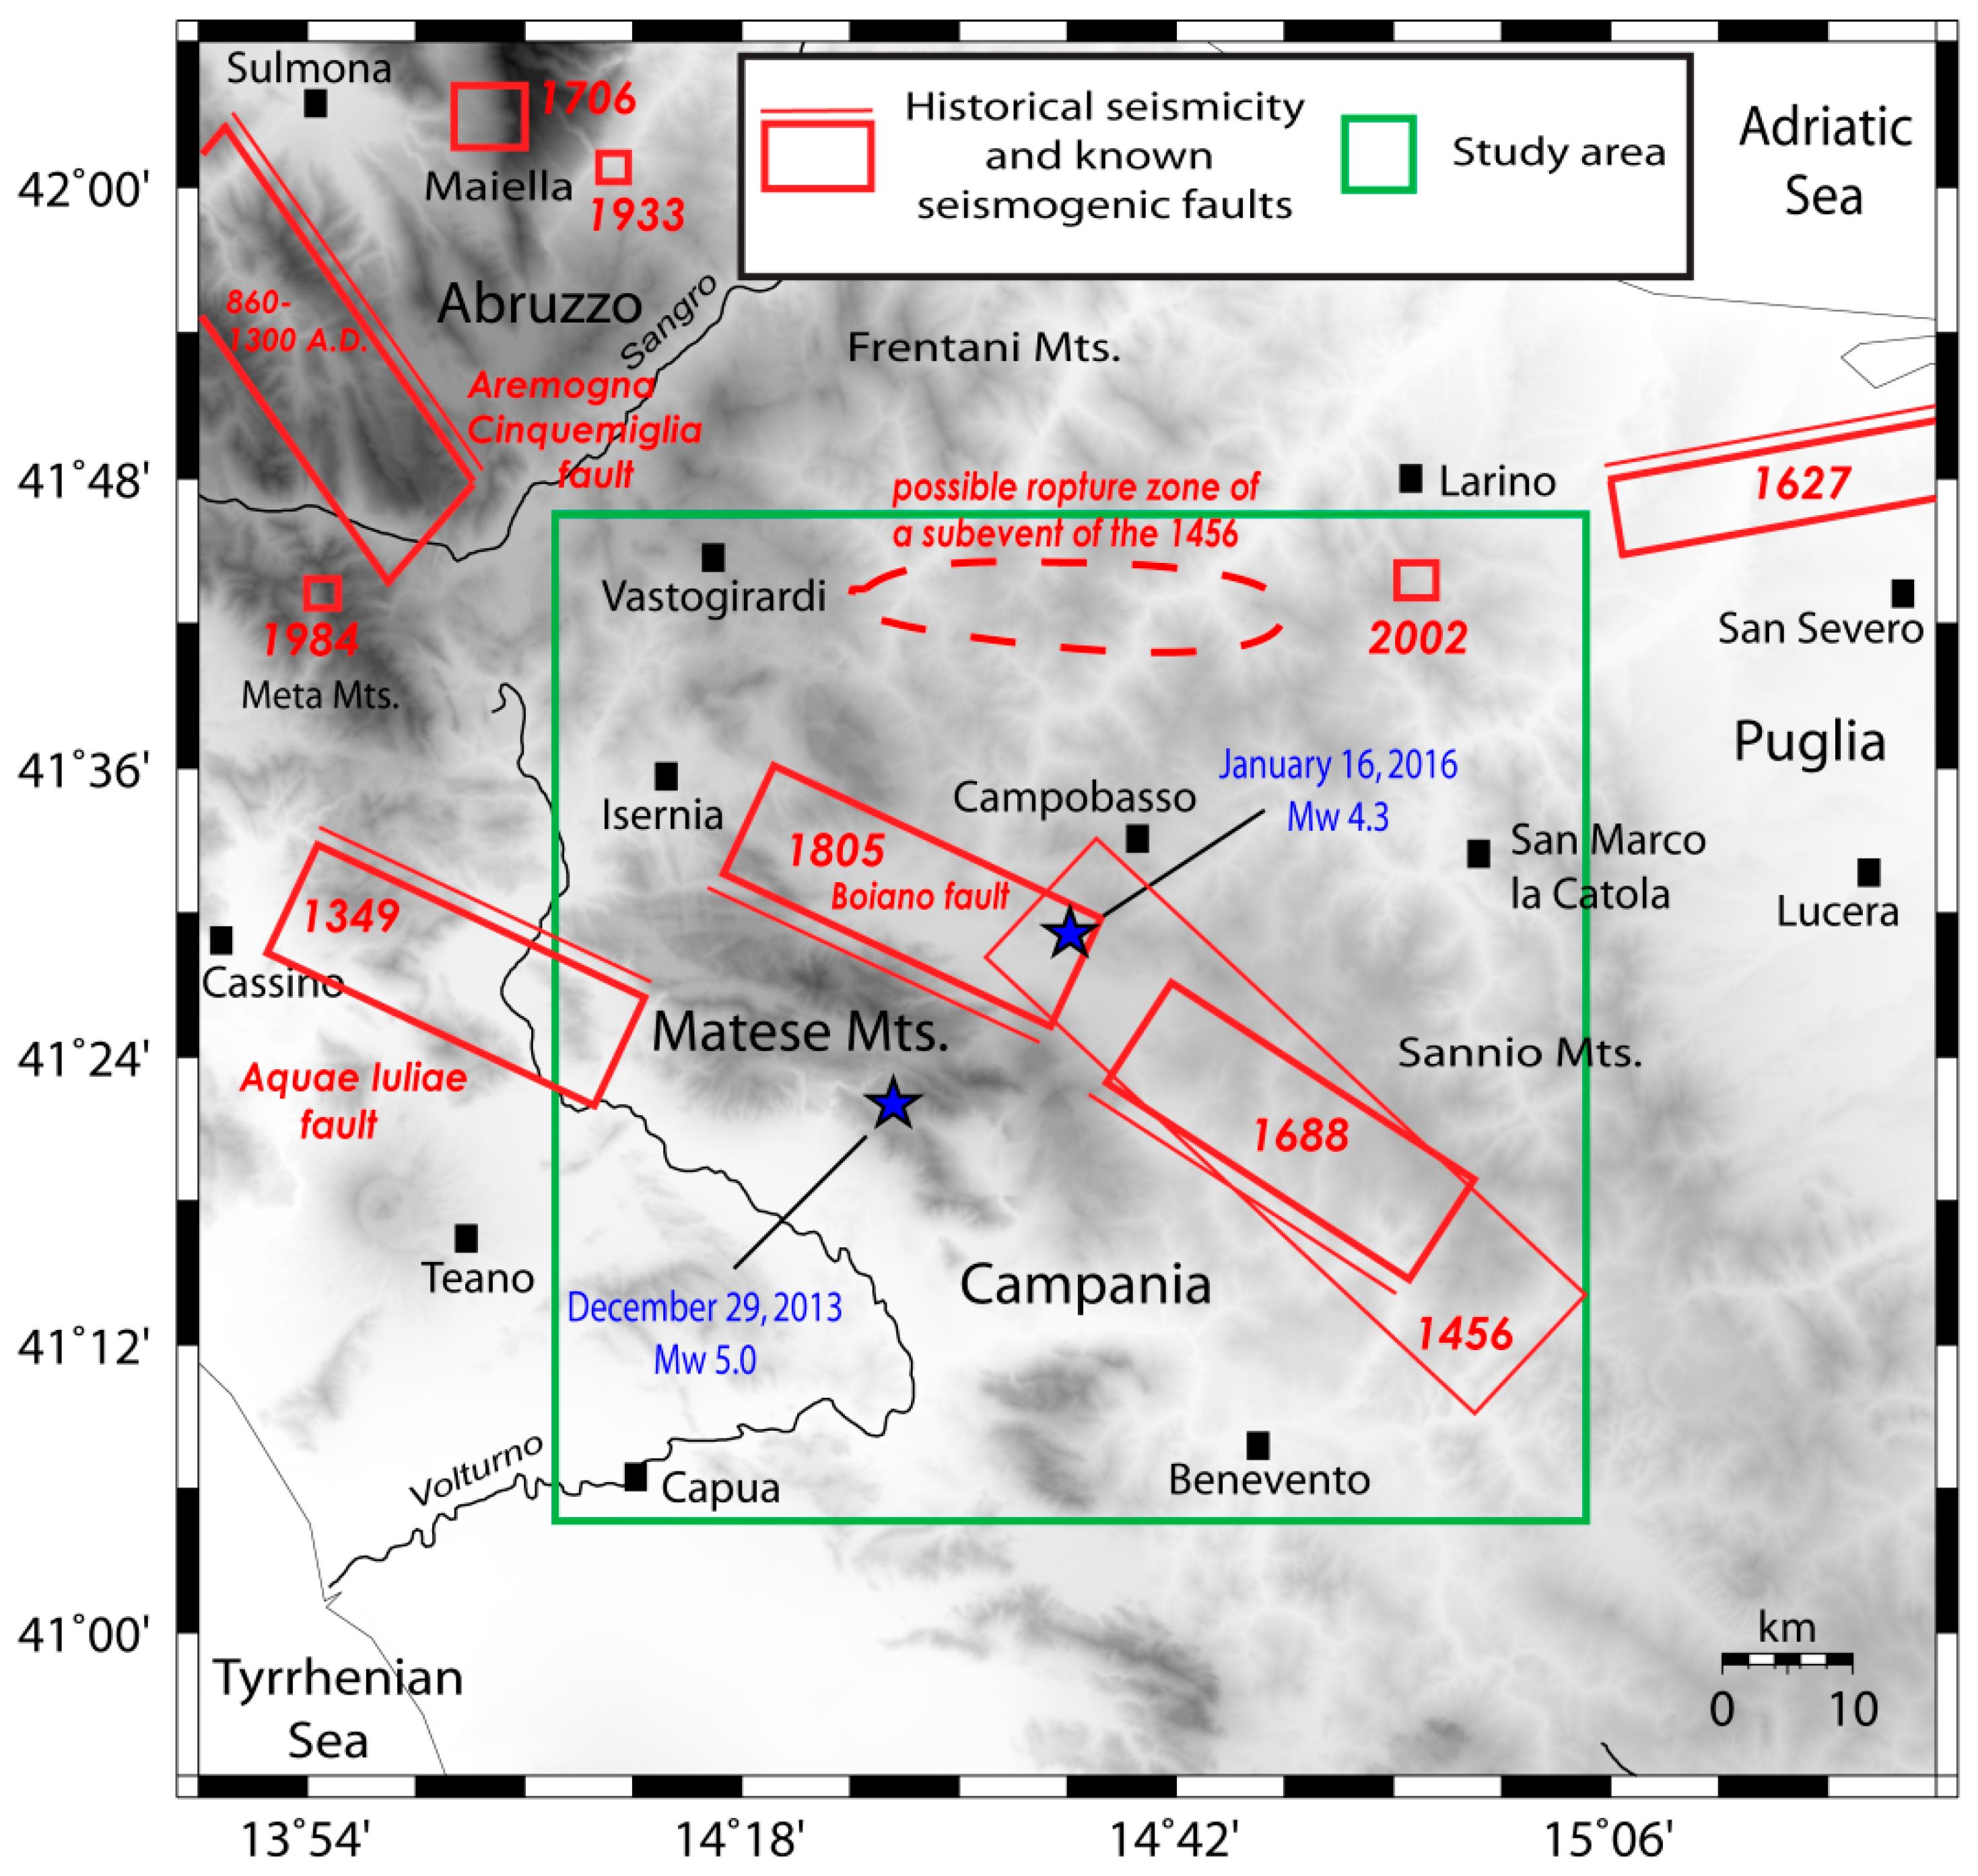 1627 Gargano earthquake